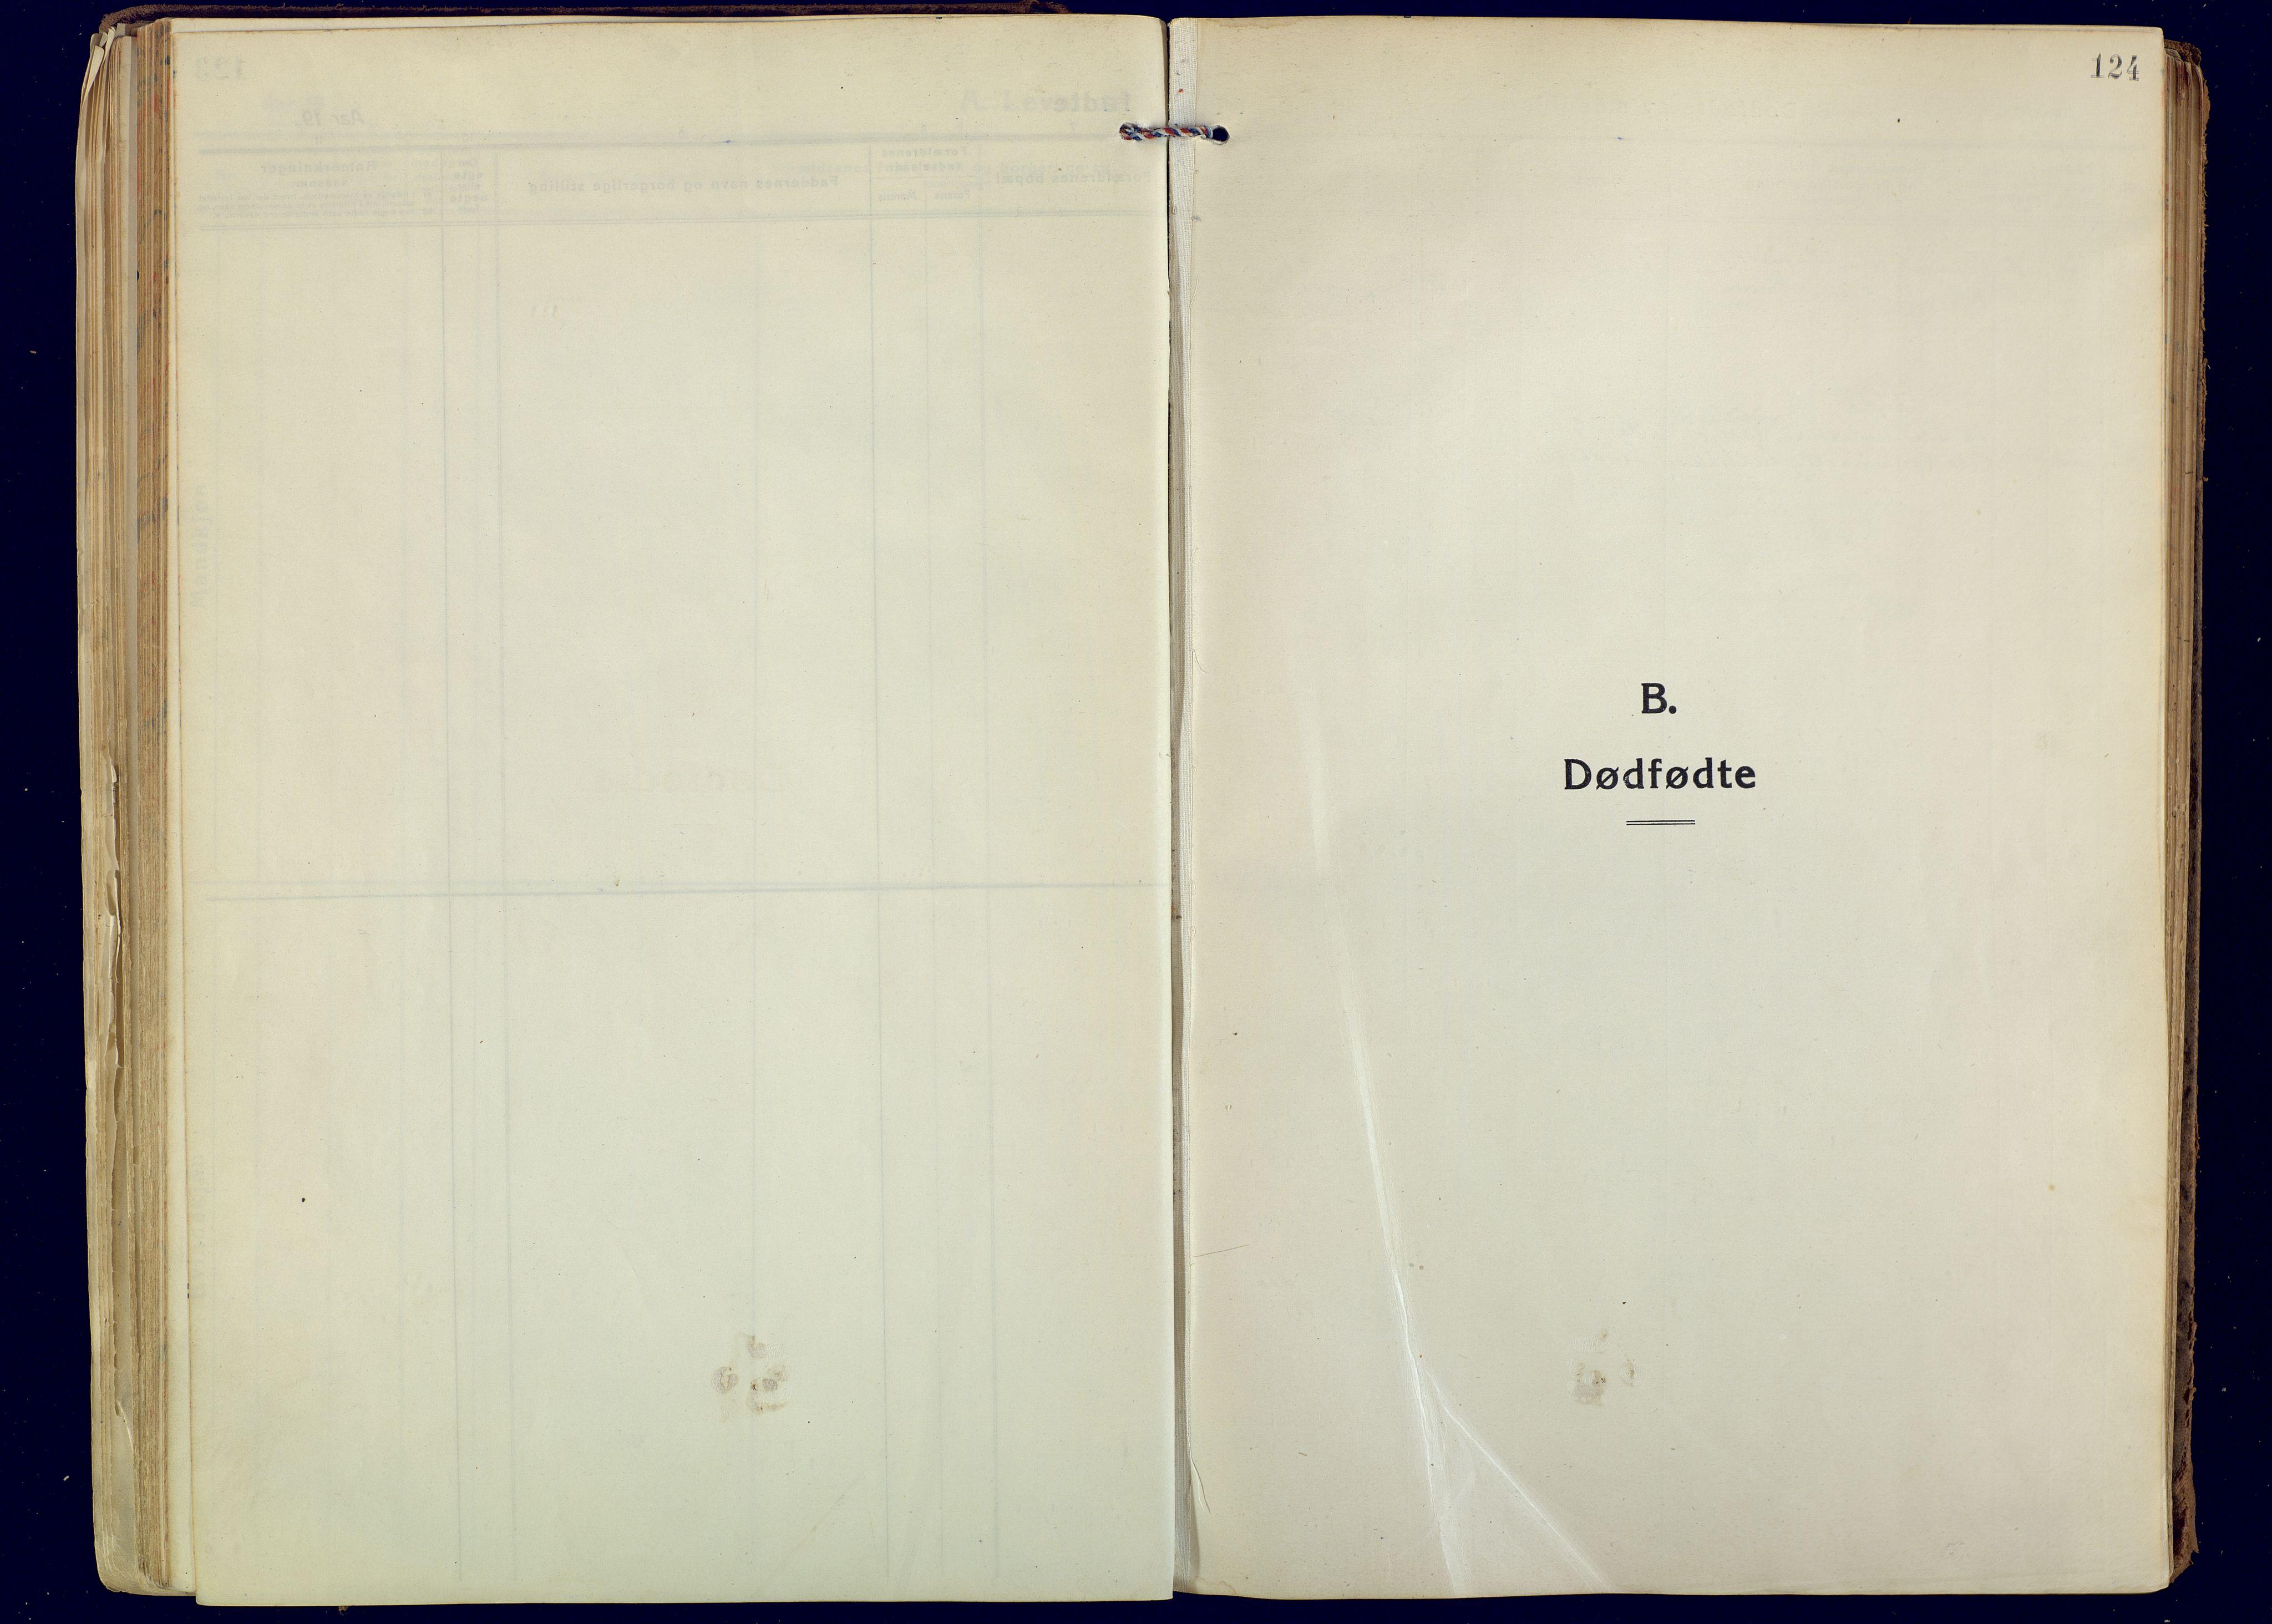 SATØ, Målselv sokneprestembete, Ministerialbok nr. 14, 1919-1932, s. 124